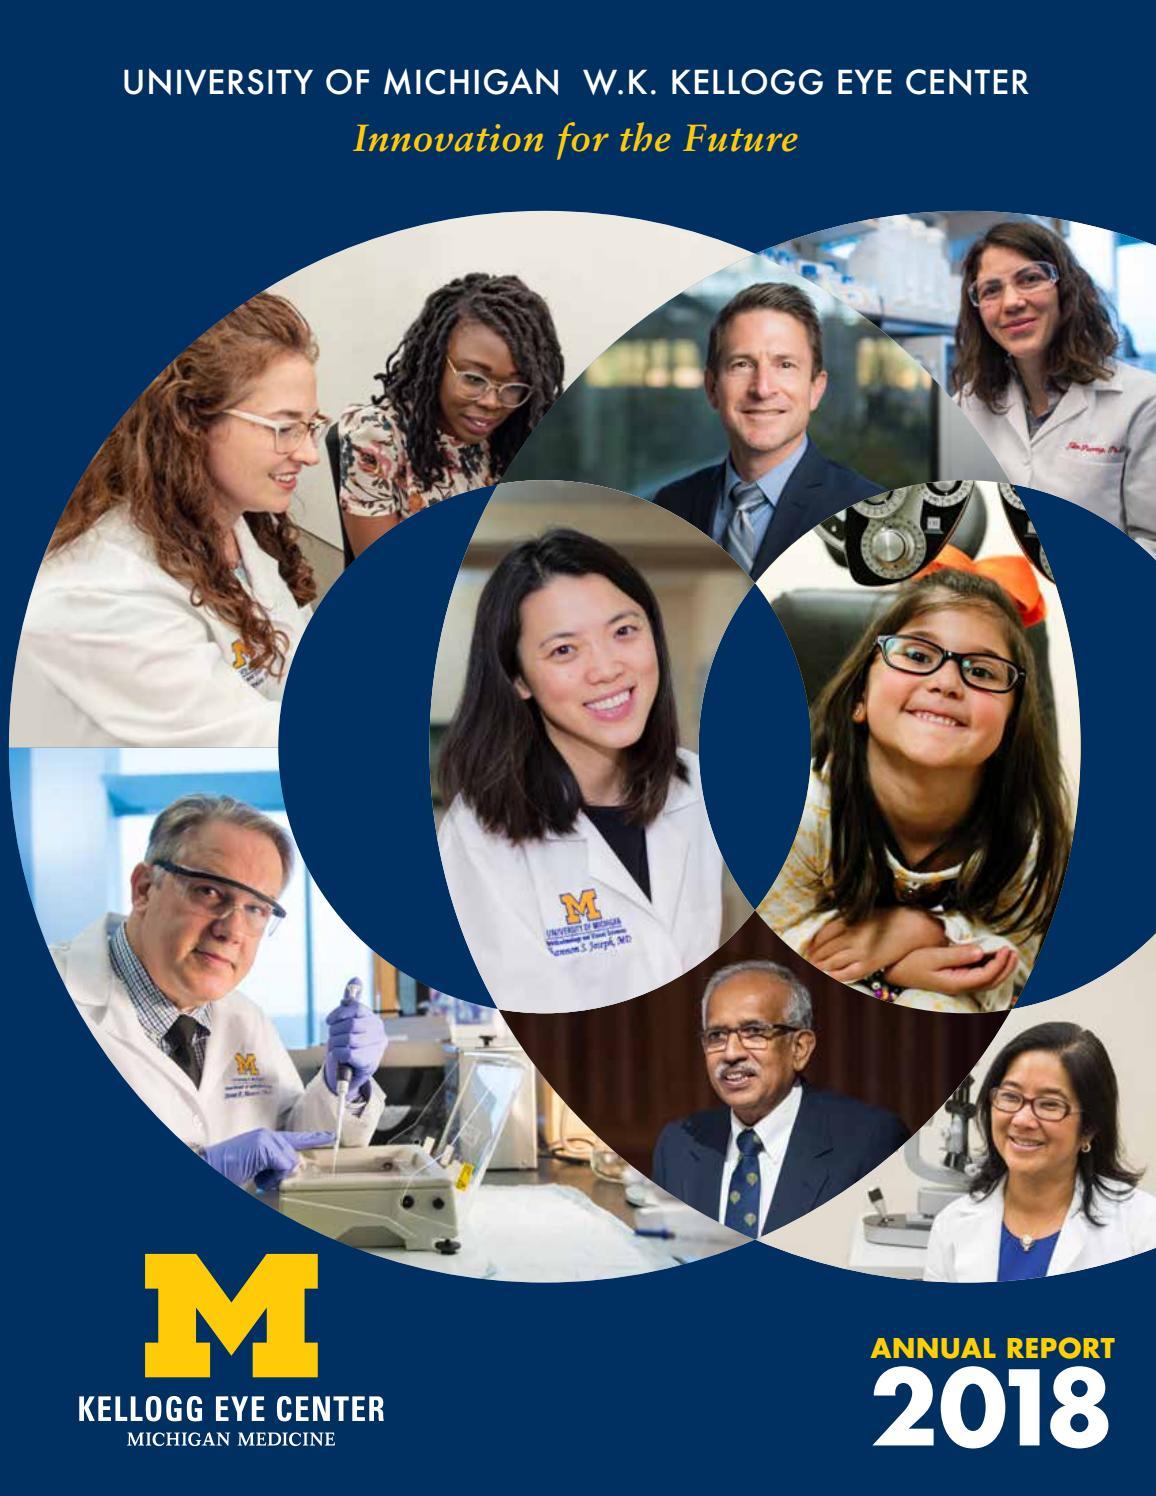 2018 U-M Kellogg Eye Center Annual Report by U-M Kellogg Eye